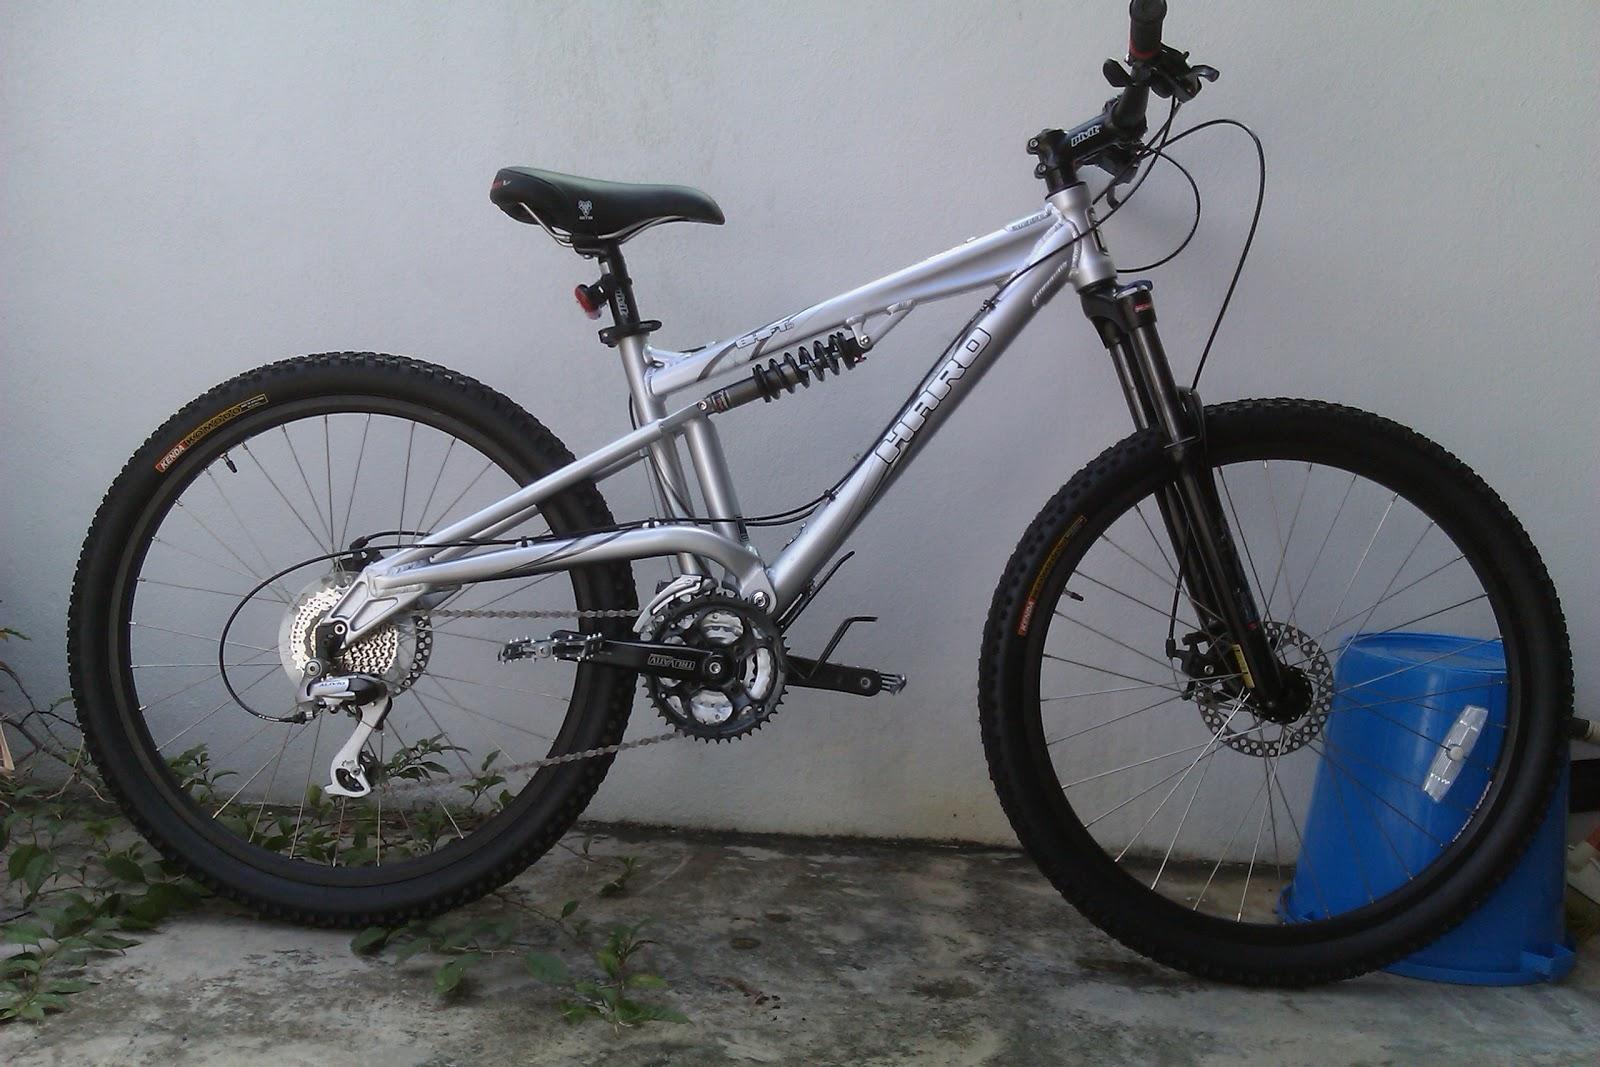 Dual Suspension Haro Mtb >> Expressing Myself New Year New Bike